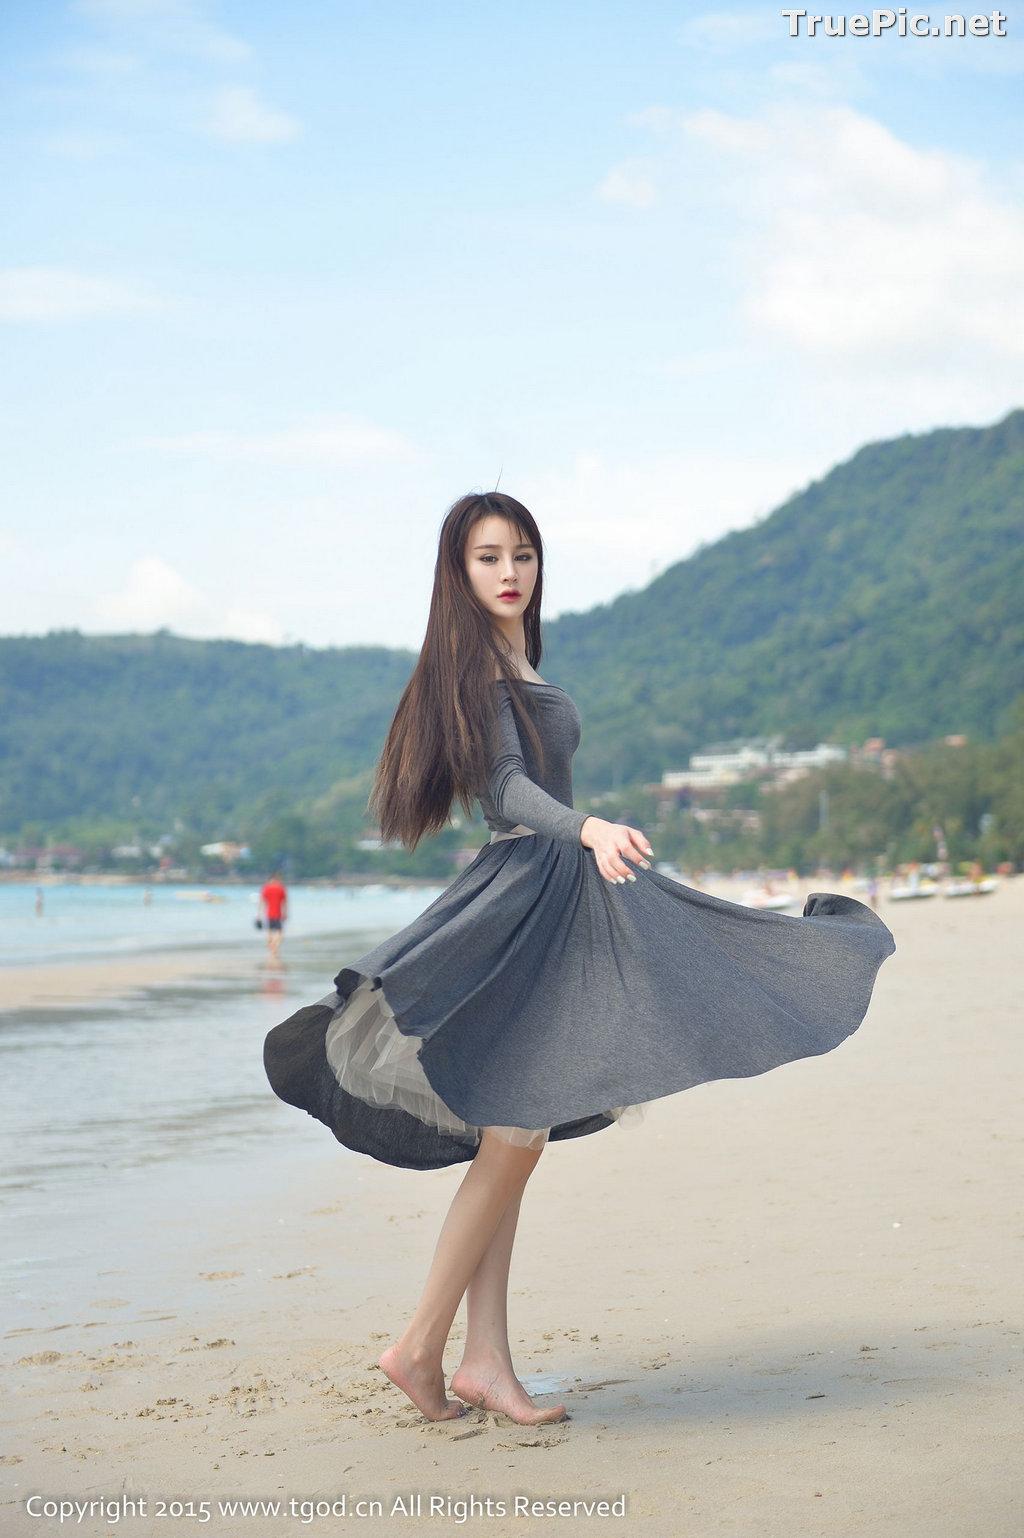 Image TGOD 2015-11-10 - Chinese Sexy Model - Cheryl (青树) - TruePic.net - Picture-45